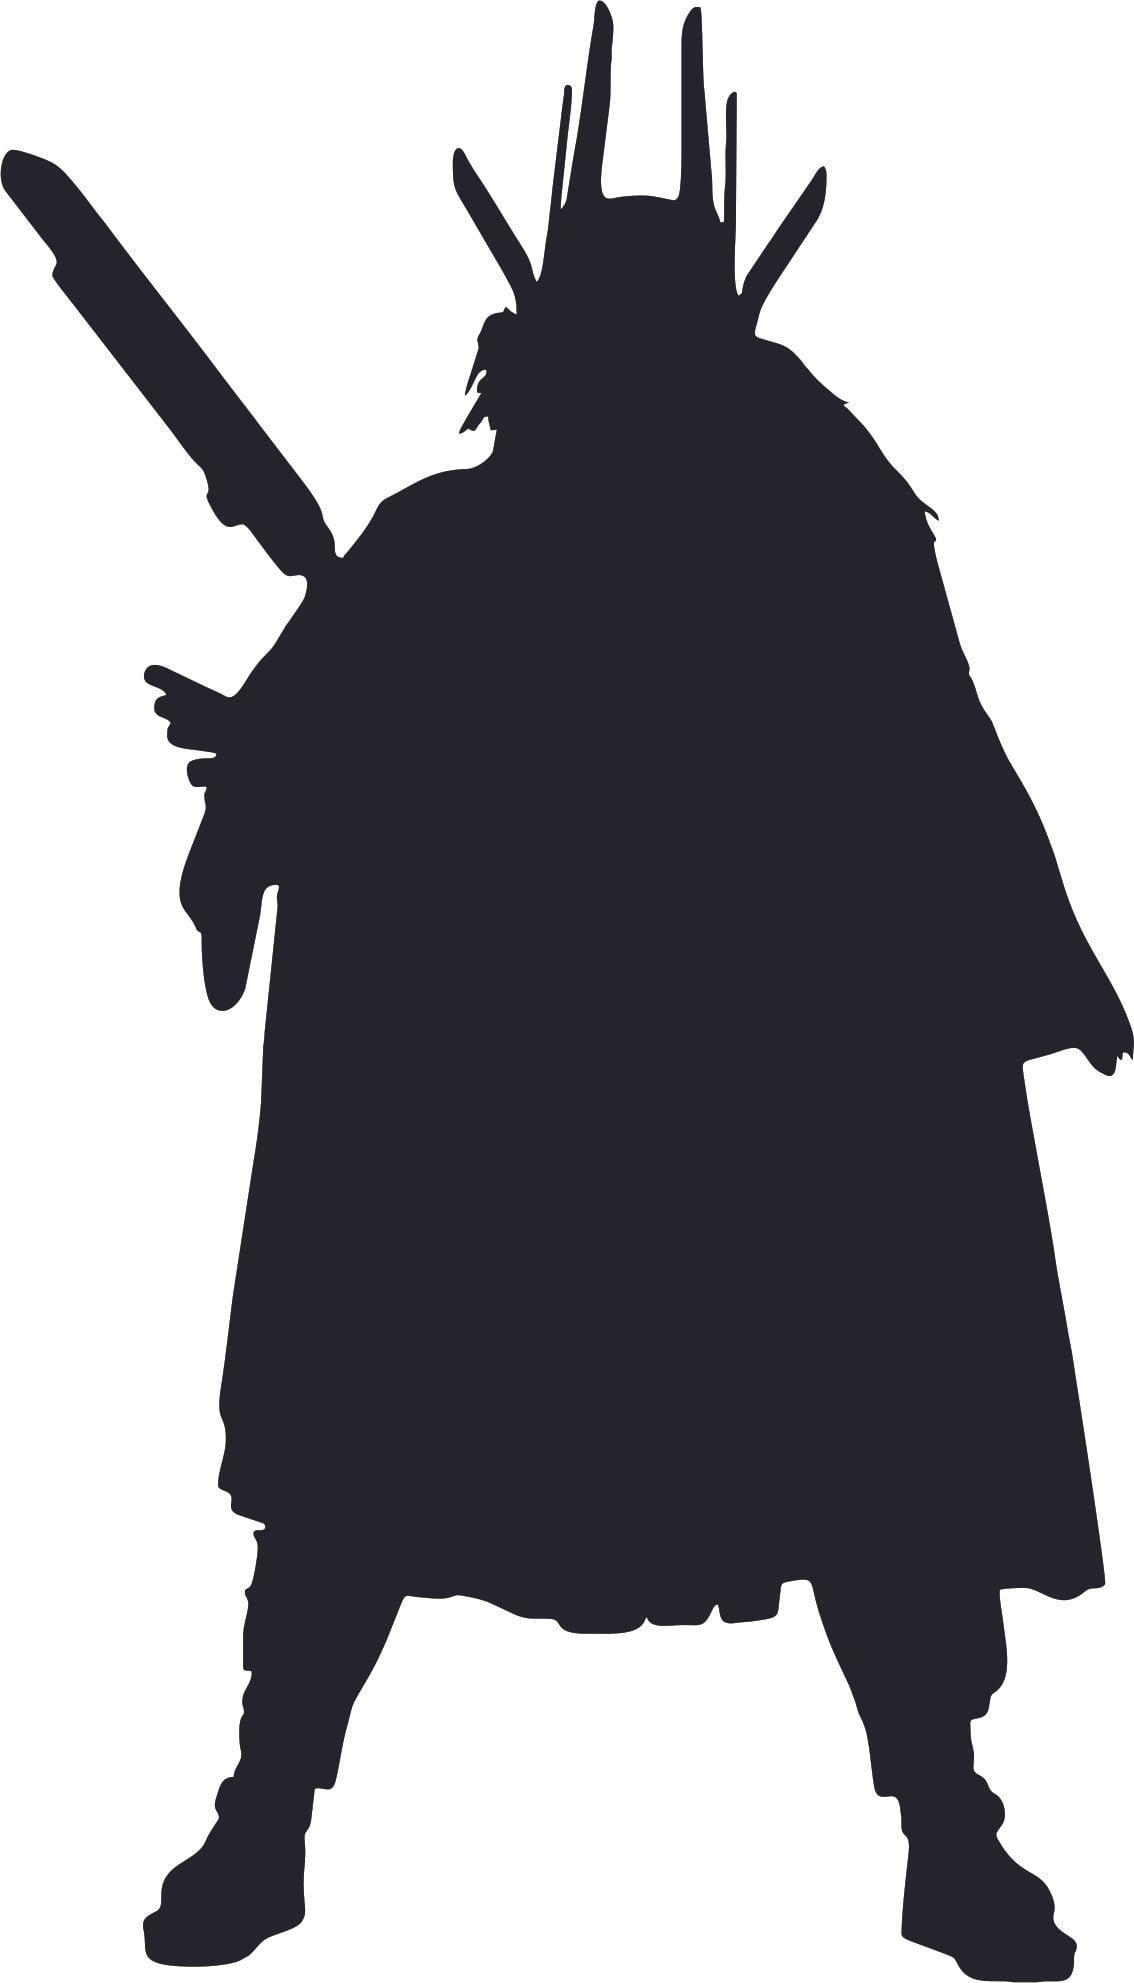 Bedroom 10x10 Size: Star Wars Chewbacca Design Cartoon Character Wall Art